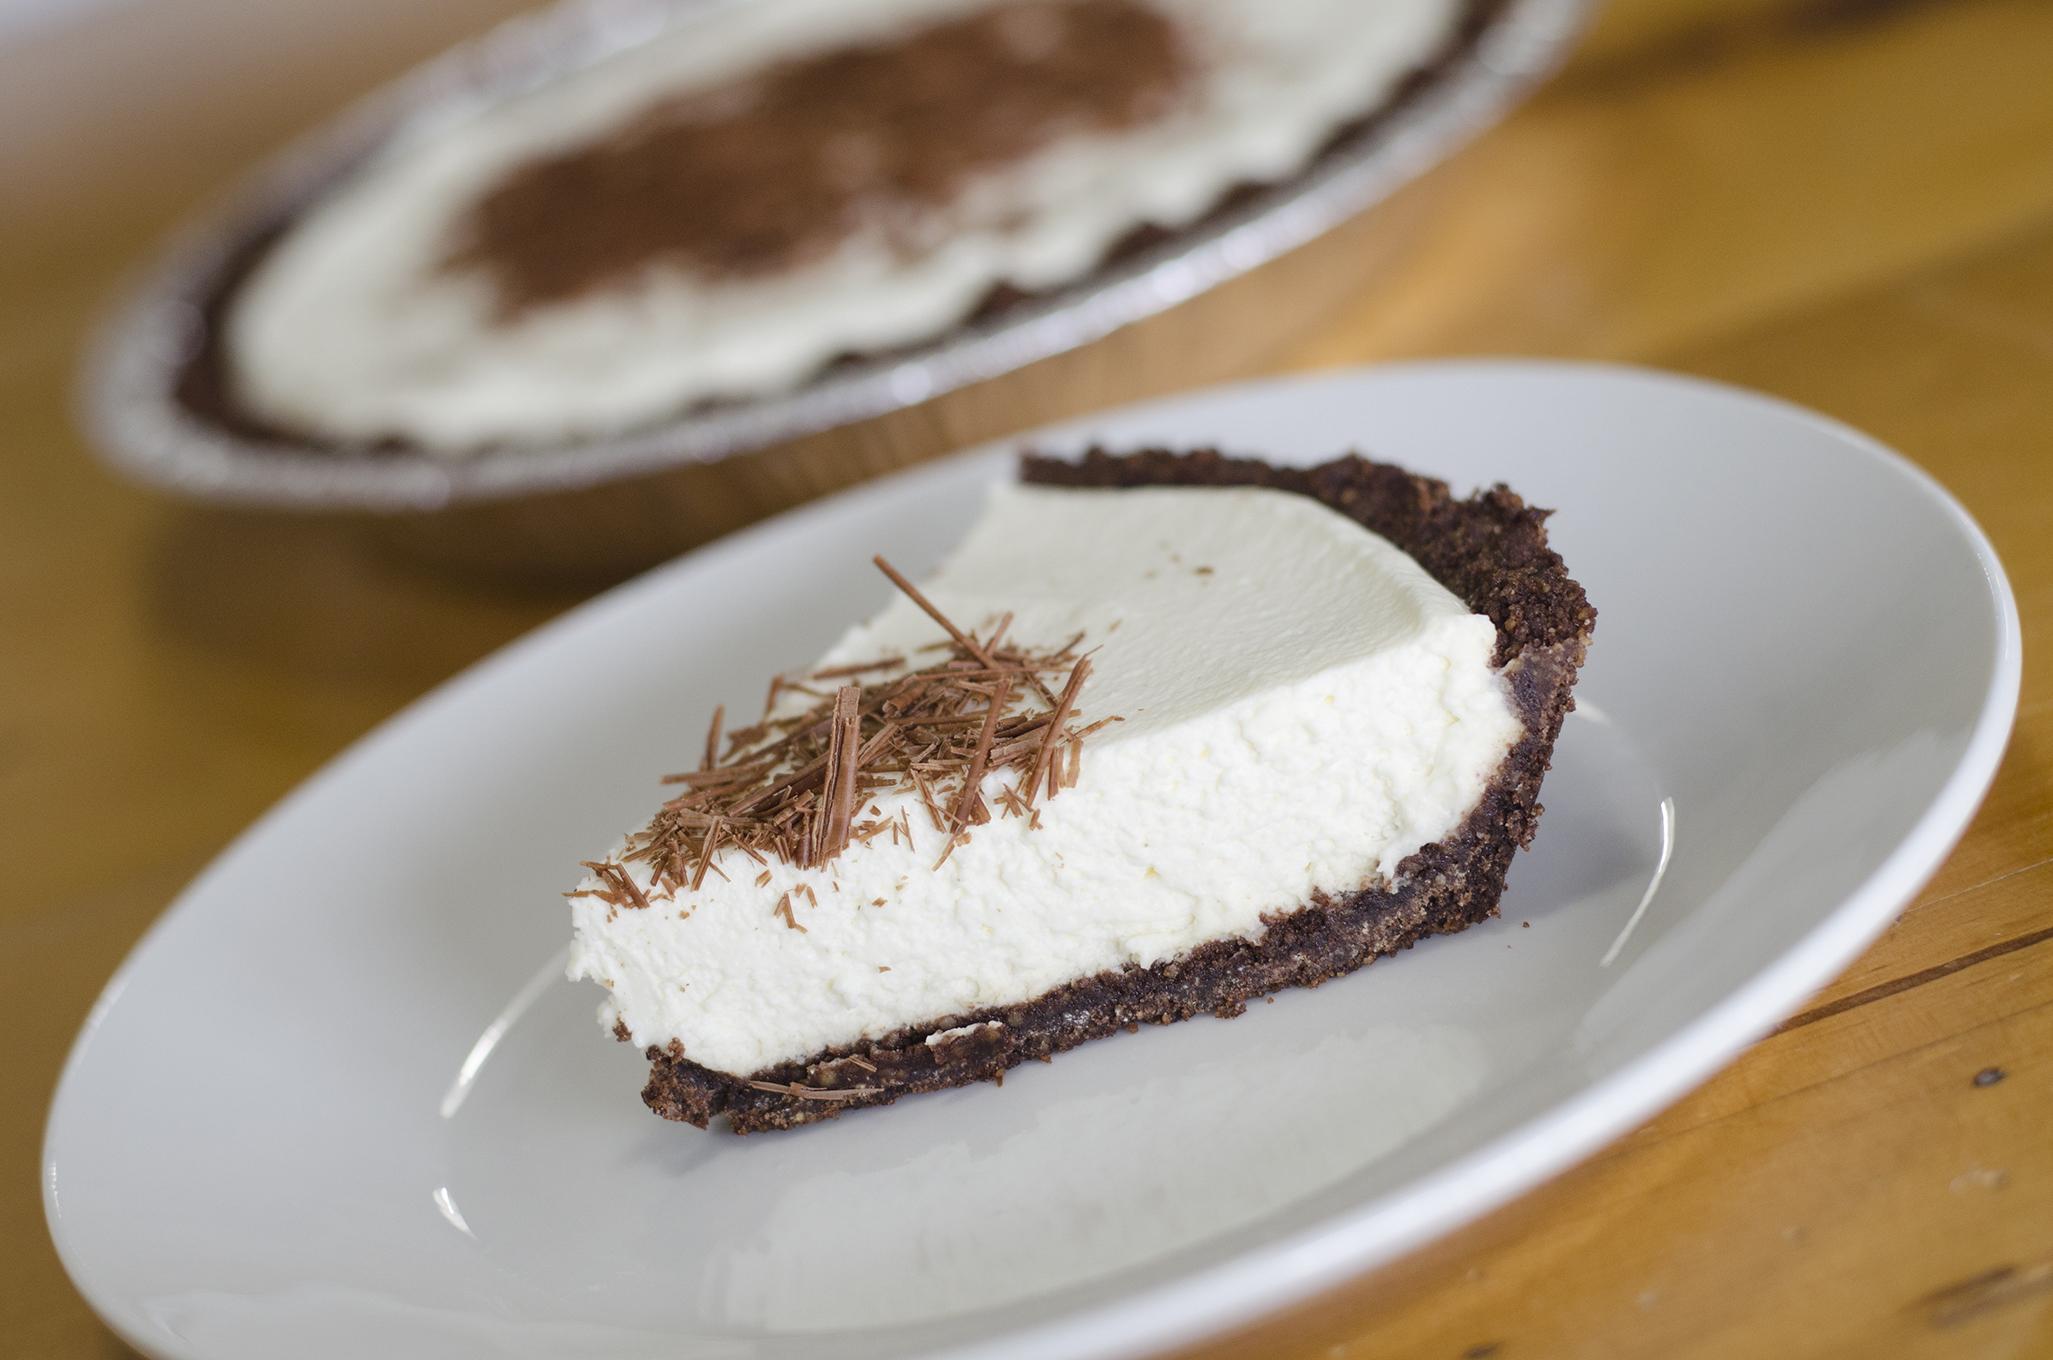 Mint Chocolate Cream pie from Riverside Pie Cafe in Windsor, Ontario.